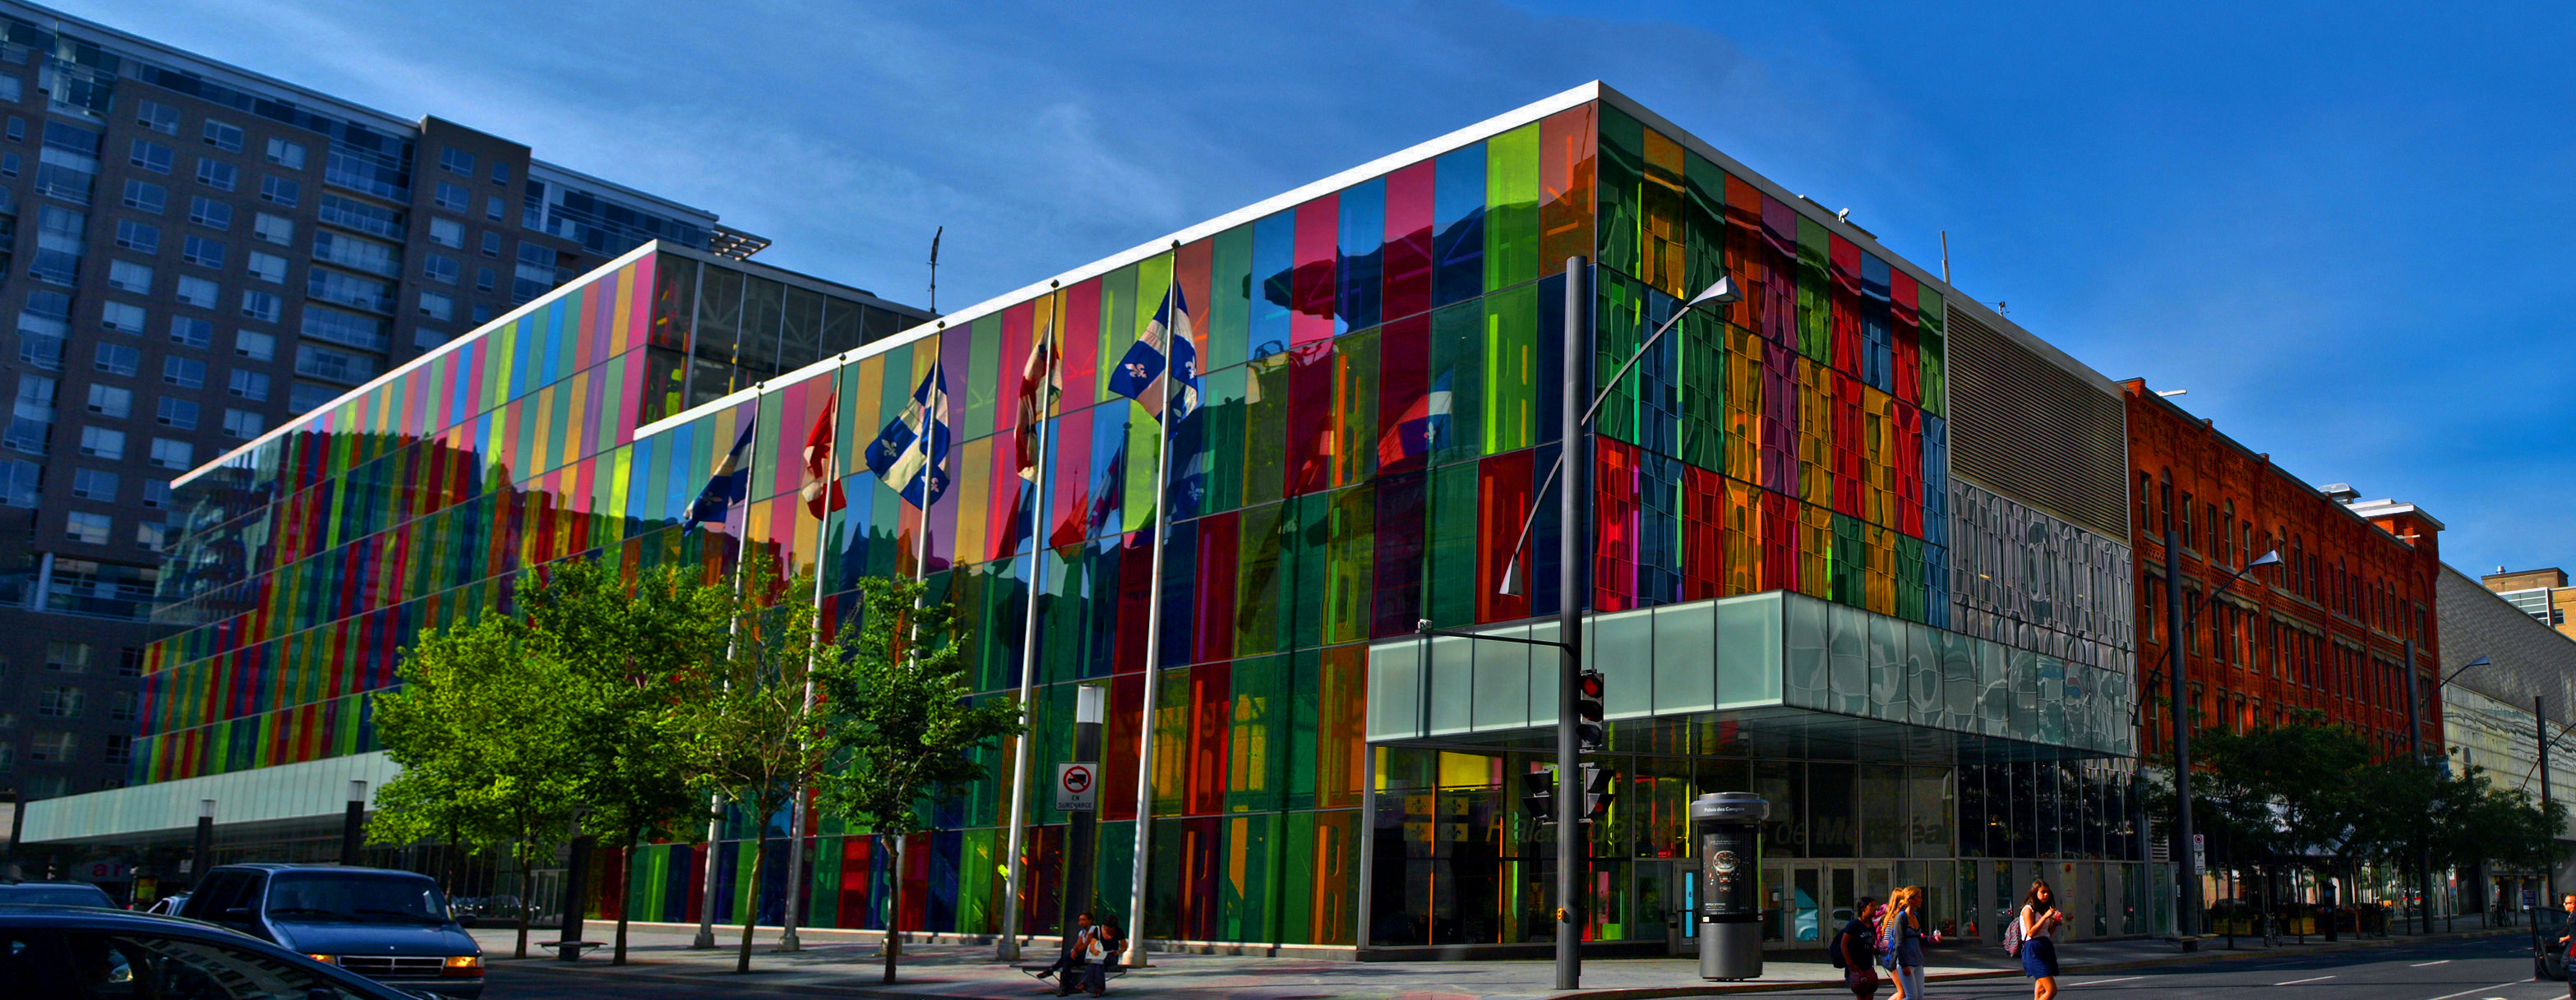 File panorama for the exterior of palais des congr s de montr wikimedia commons - Salon de l emploi palais des congres ...